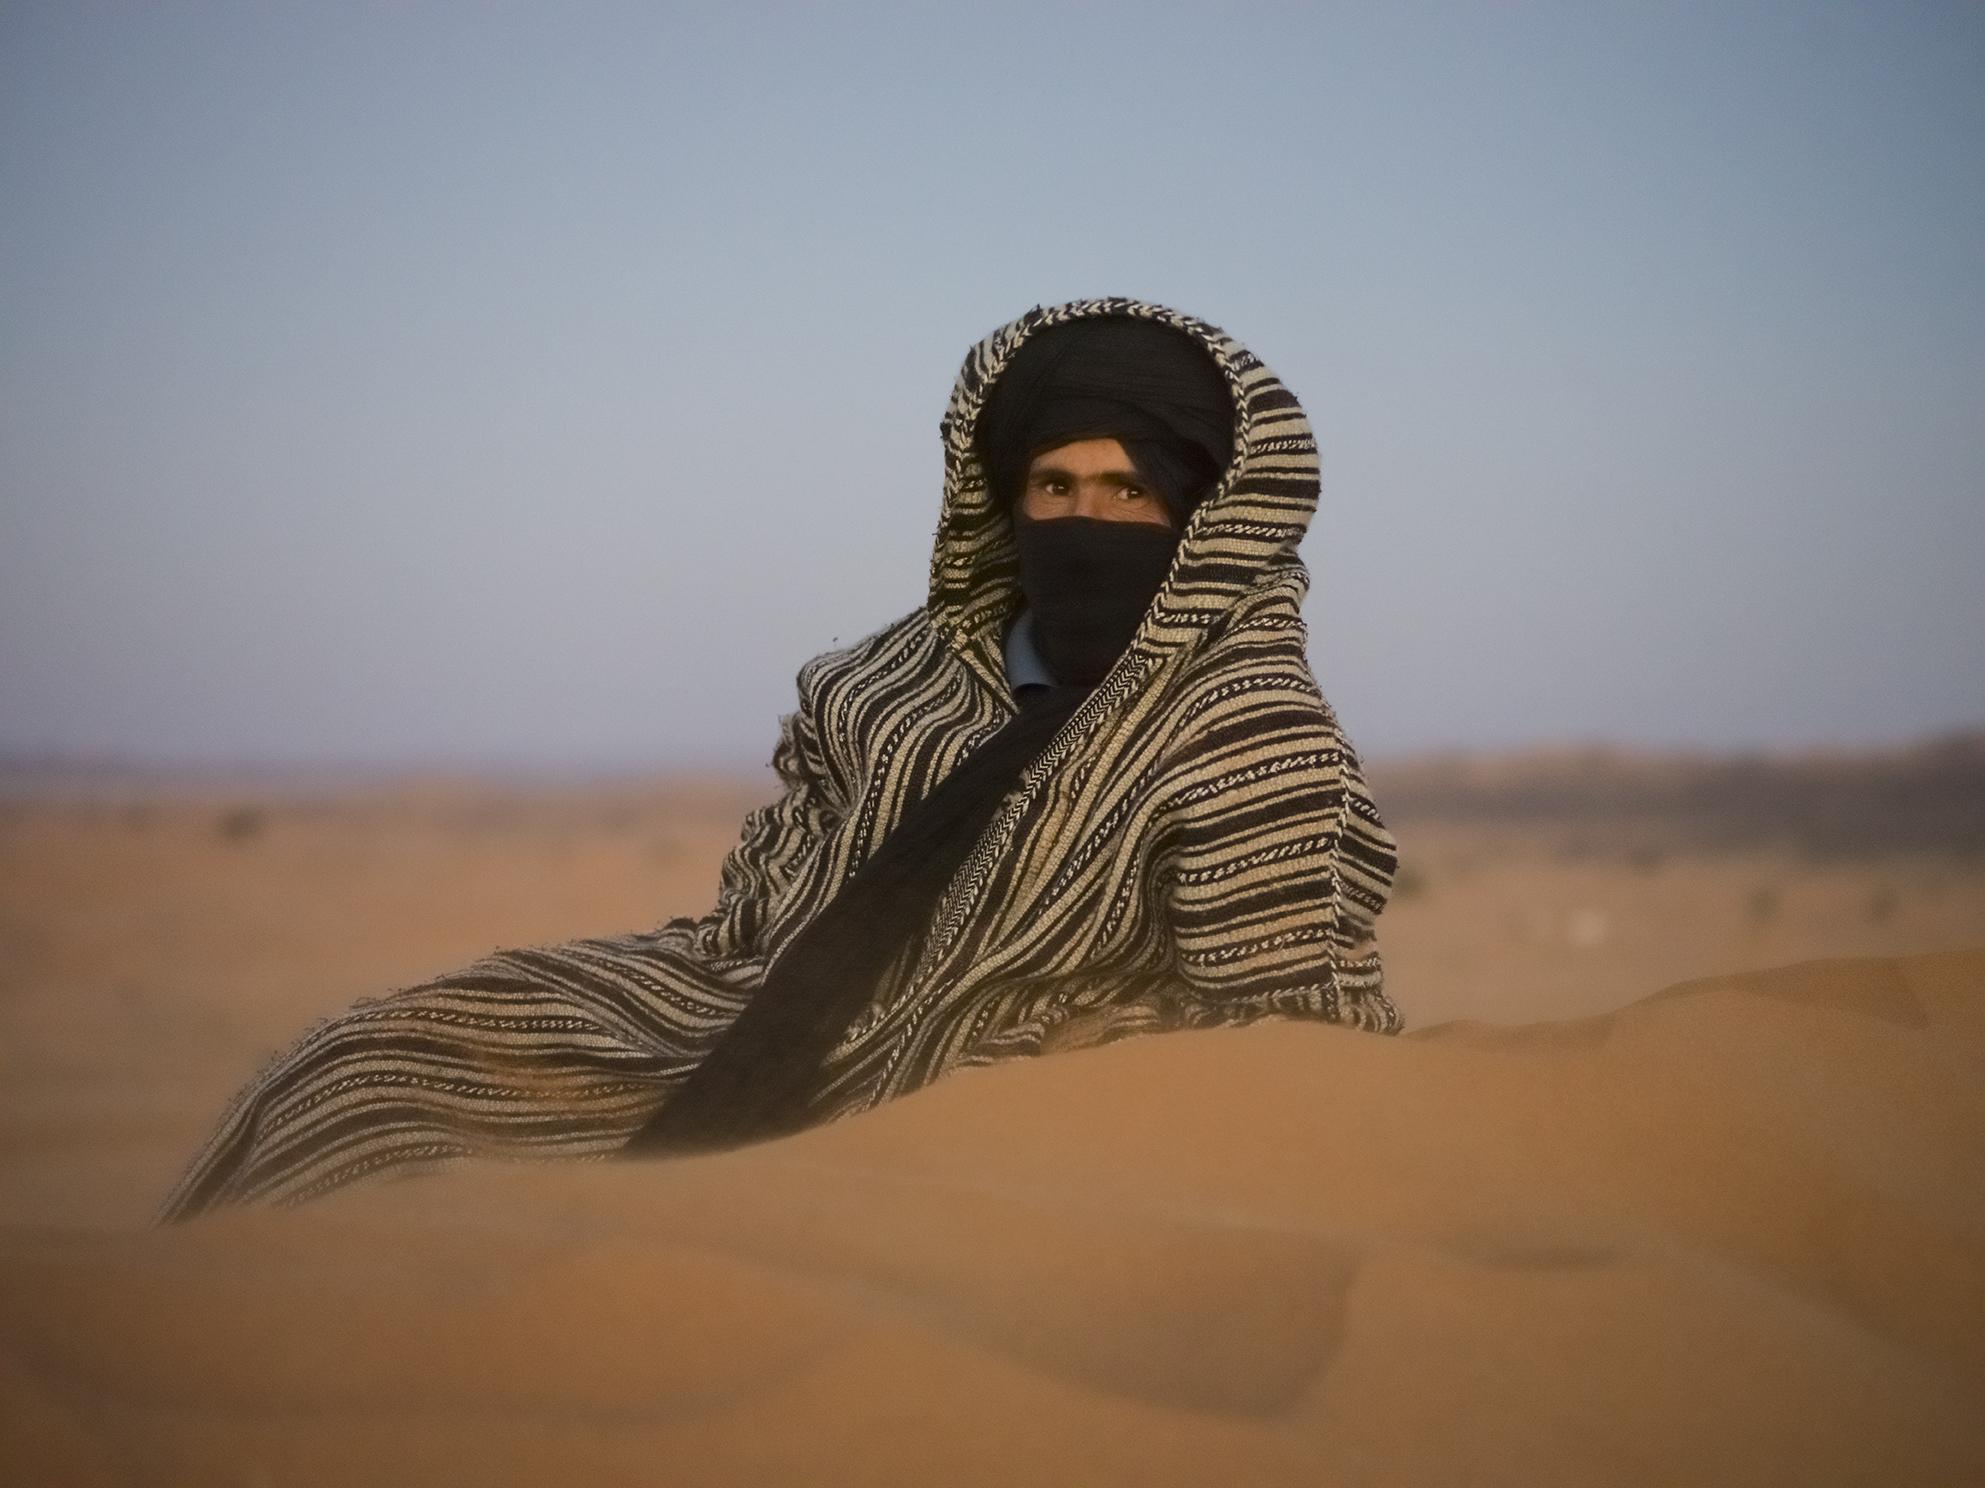 Yaish | East Sahara, Morocco. November 2018.